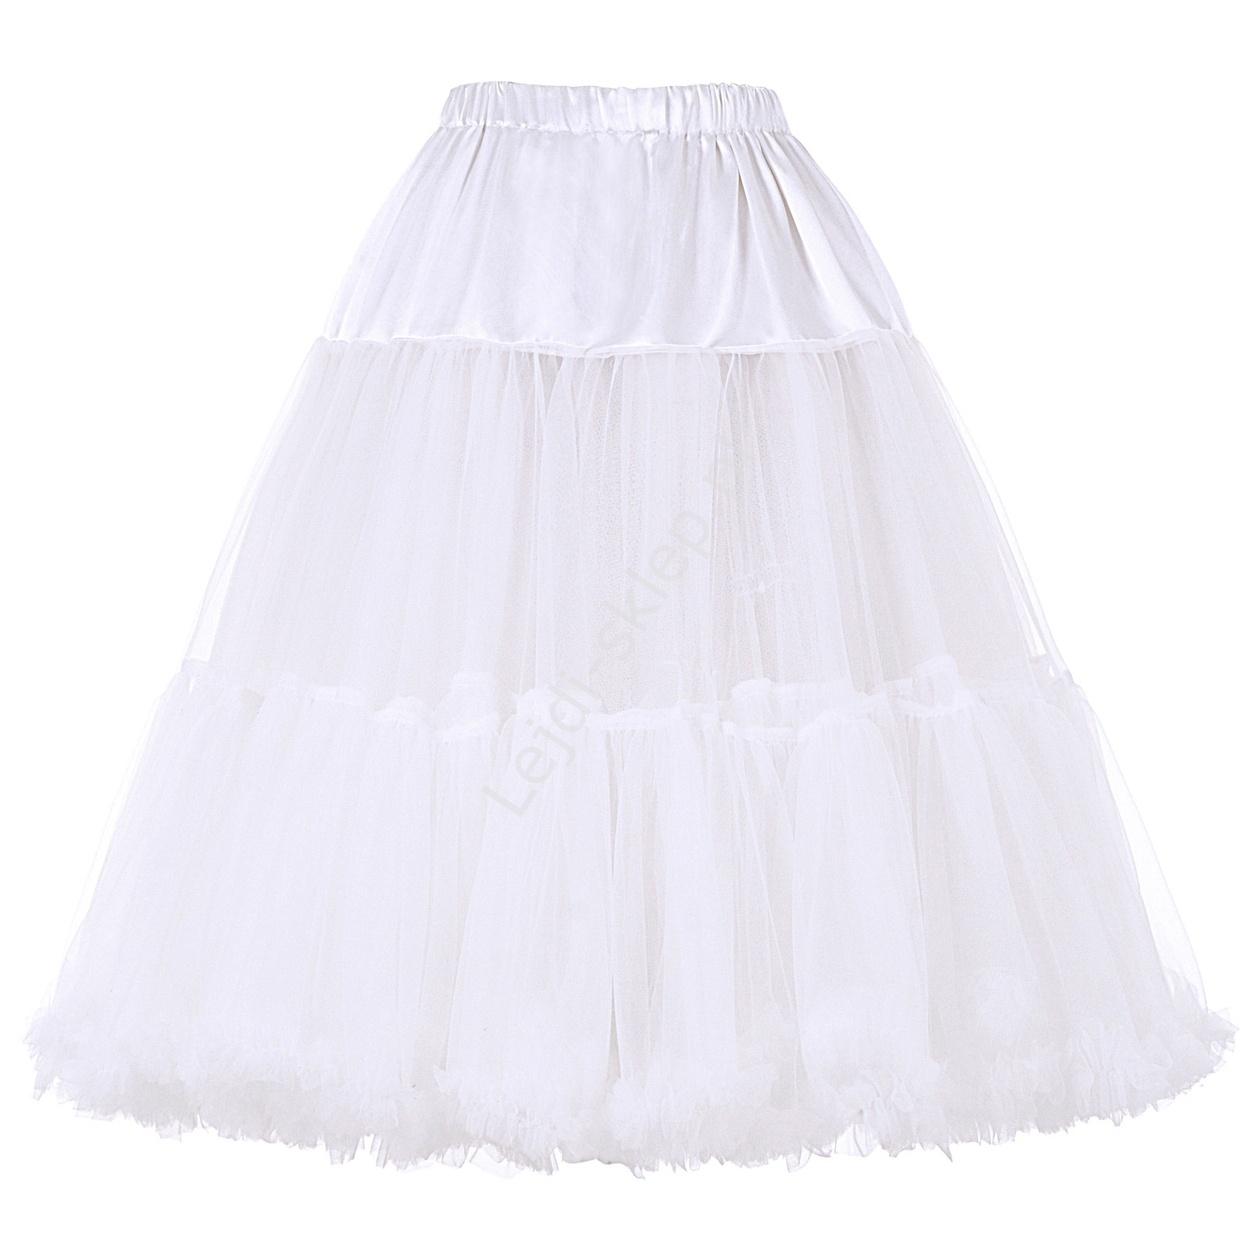 e97cb9d4 Halka tiulowa bardzo mocno unosząca sukienkę   halka do spódnic pin ...